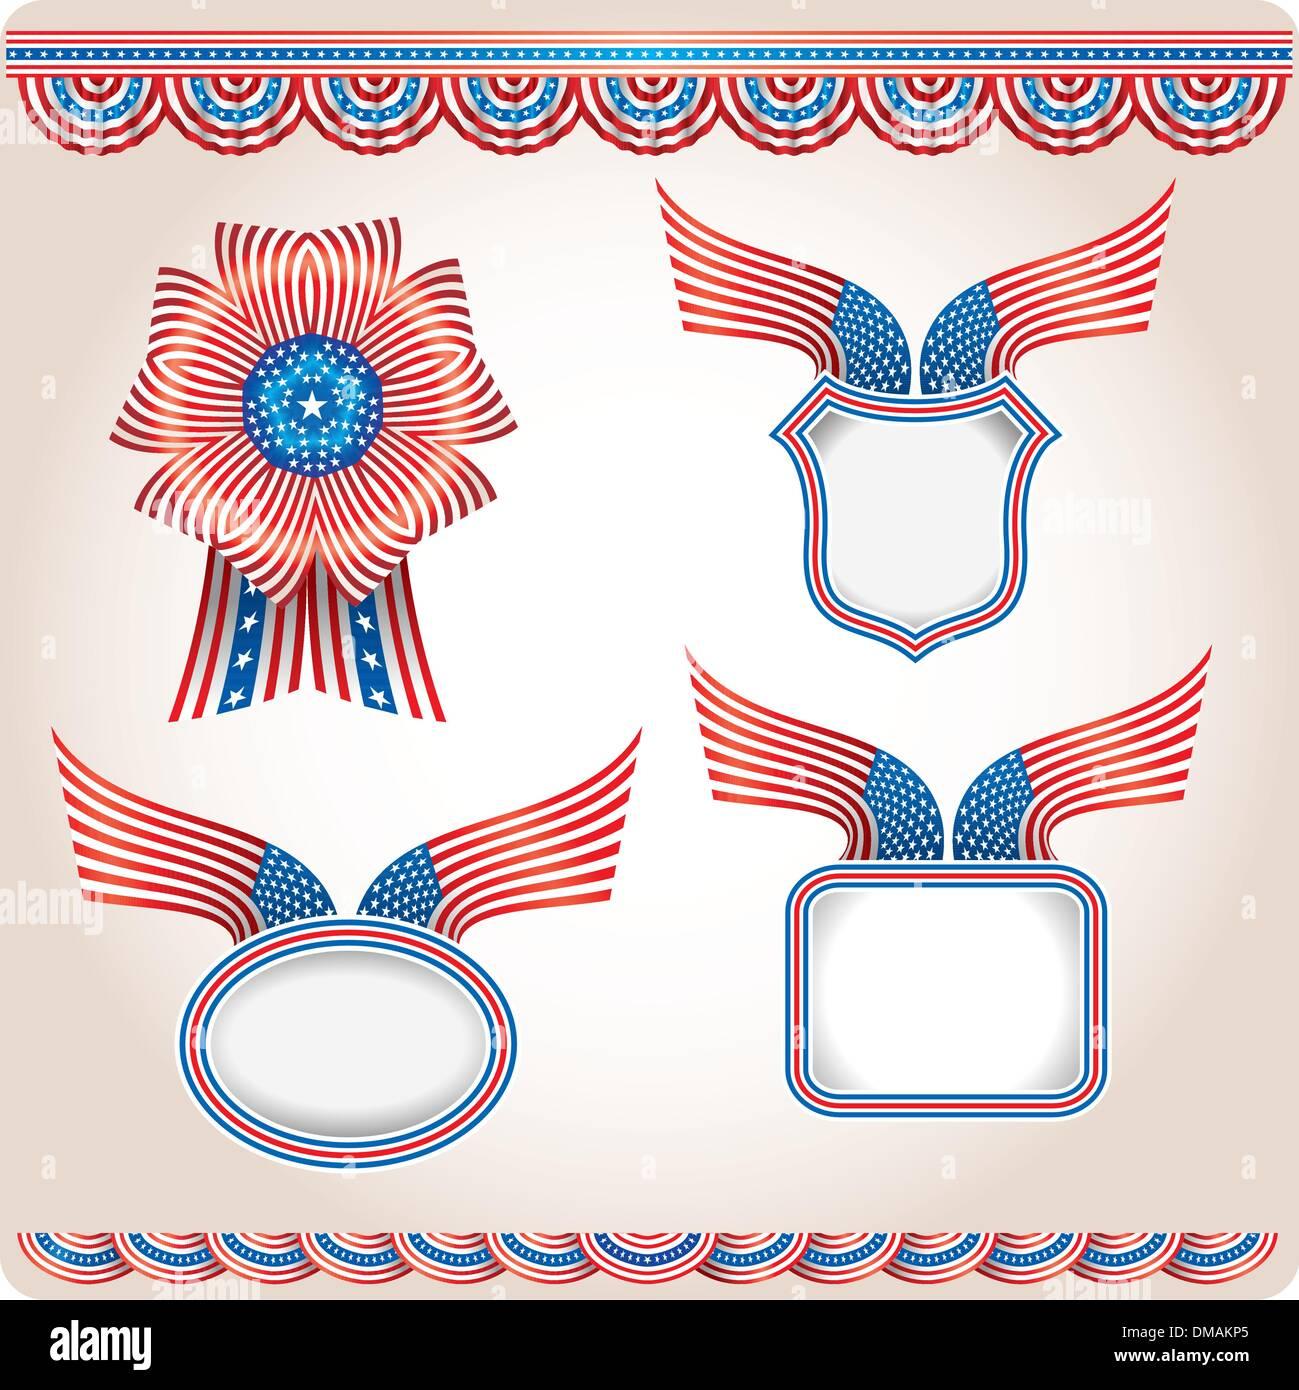 Americana - Set 2 - Stock Image